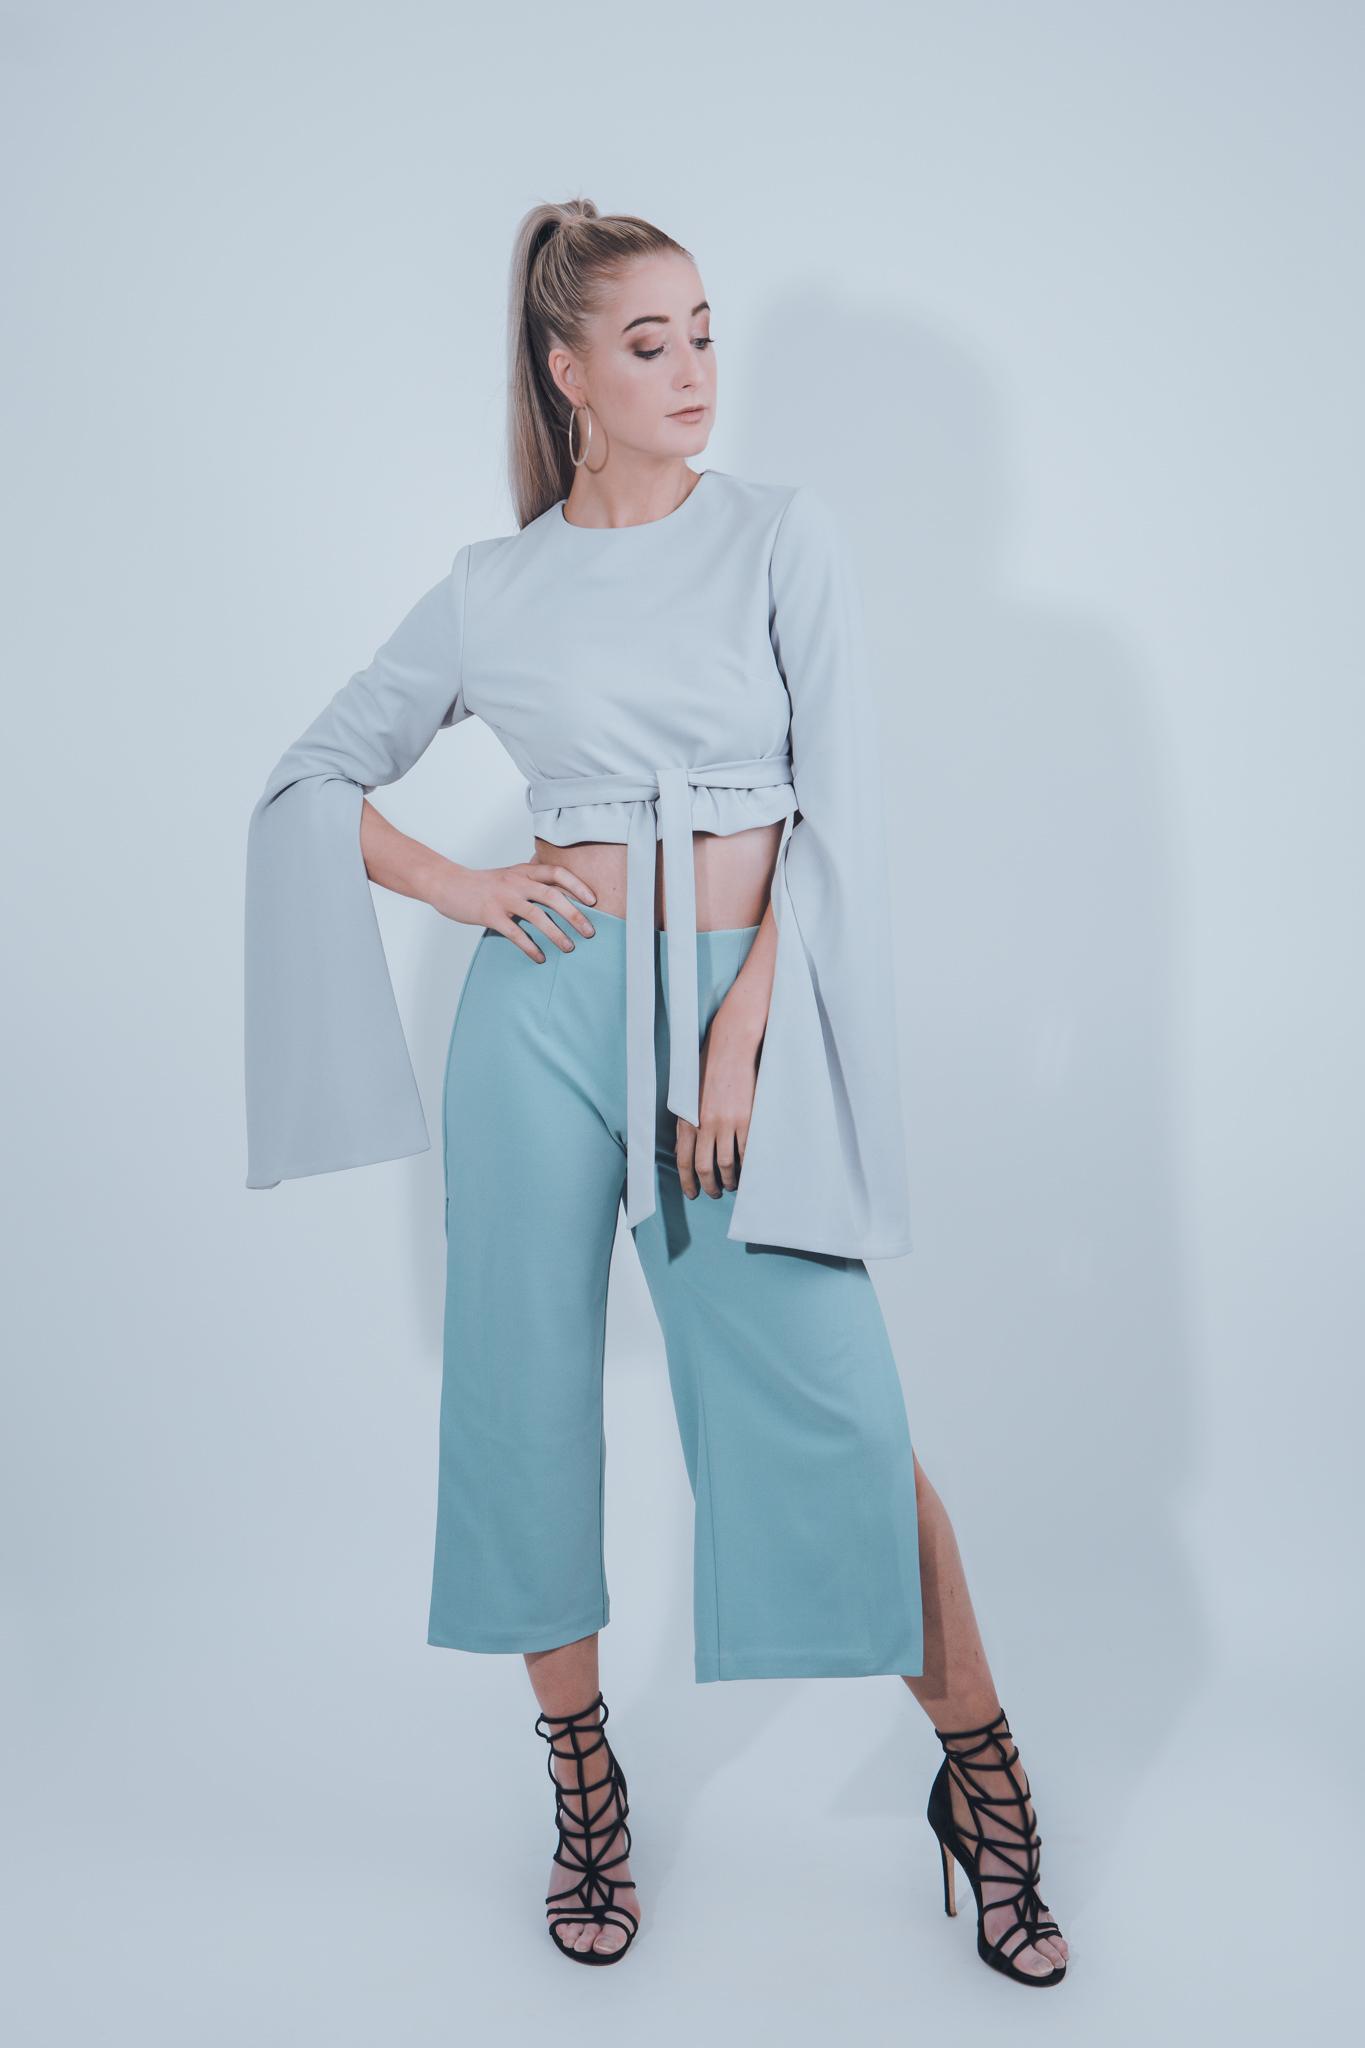 Lookbook shoot for Kimberley Elle